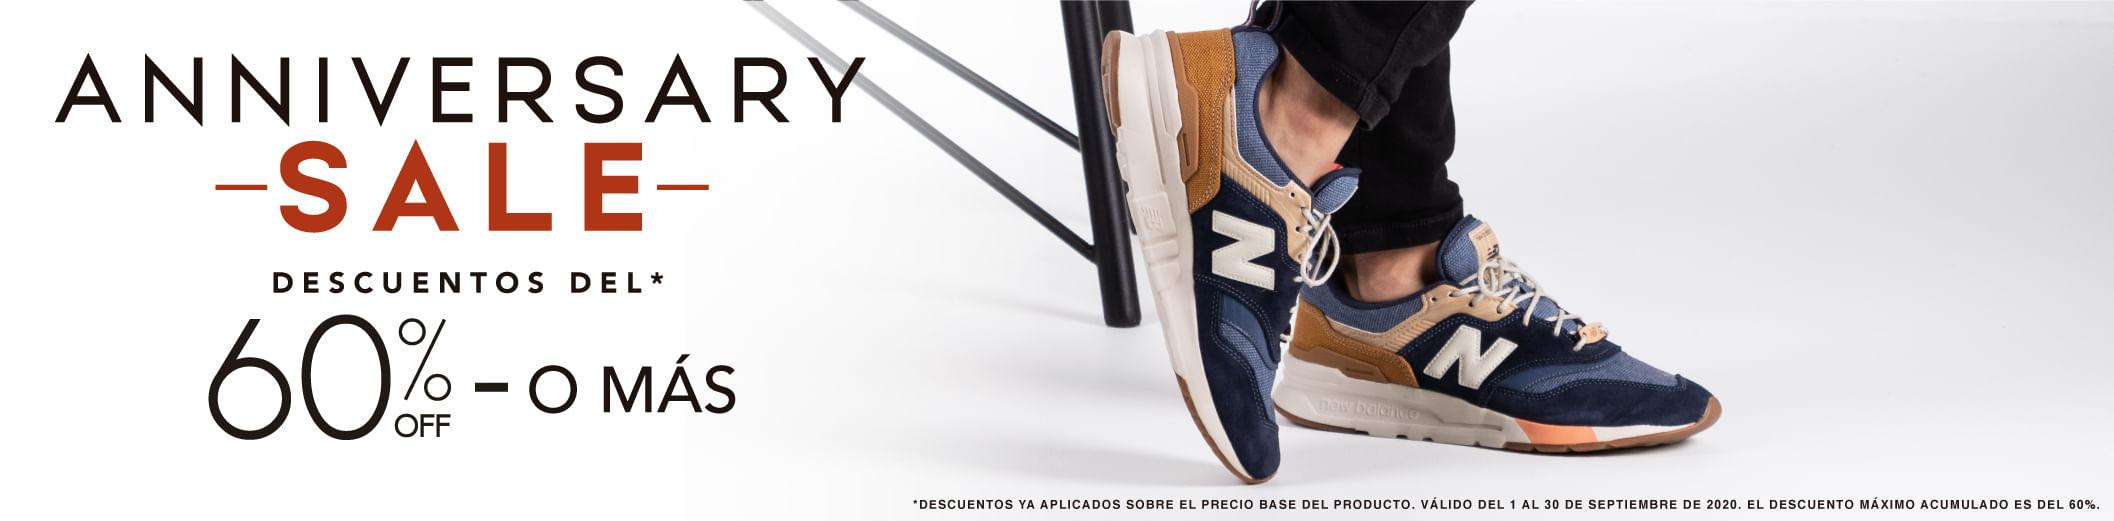 Zapatos Para Hombre Desde 60% Off